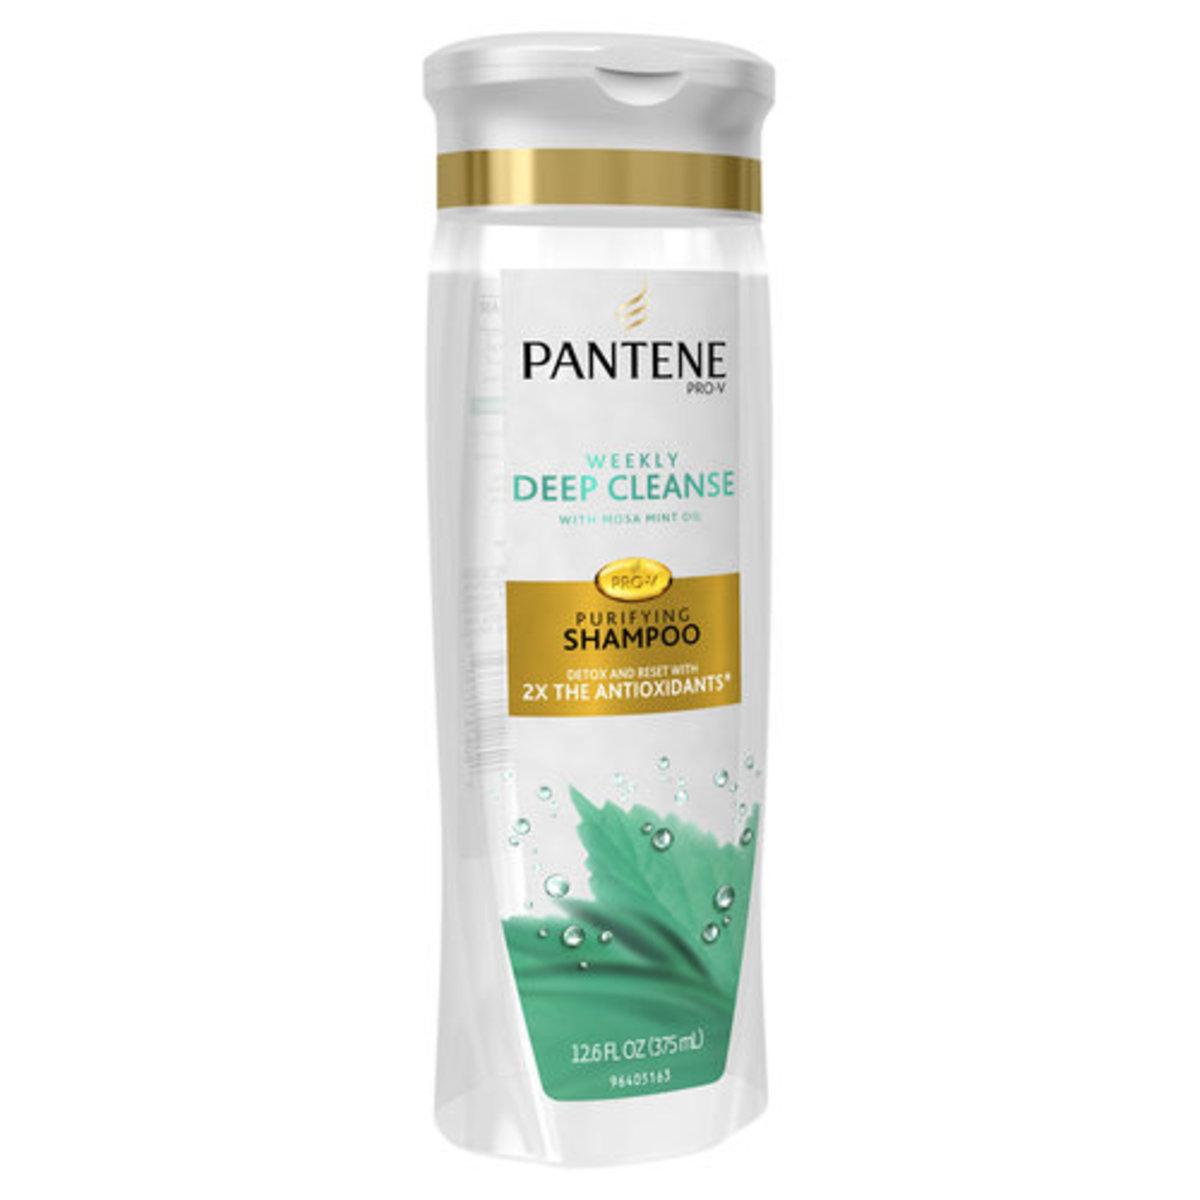 Pantene Damage Detox Deep Cleanse Purifying Shampoo